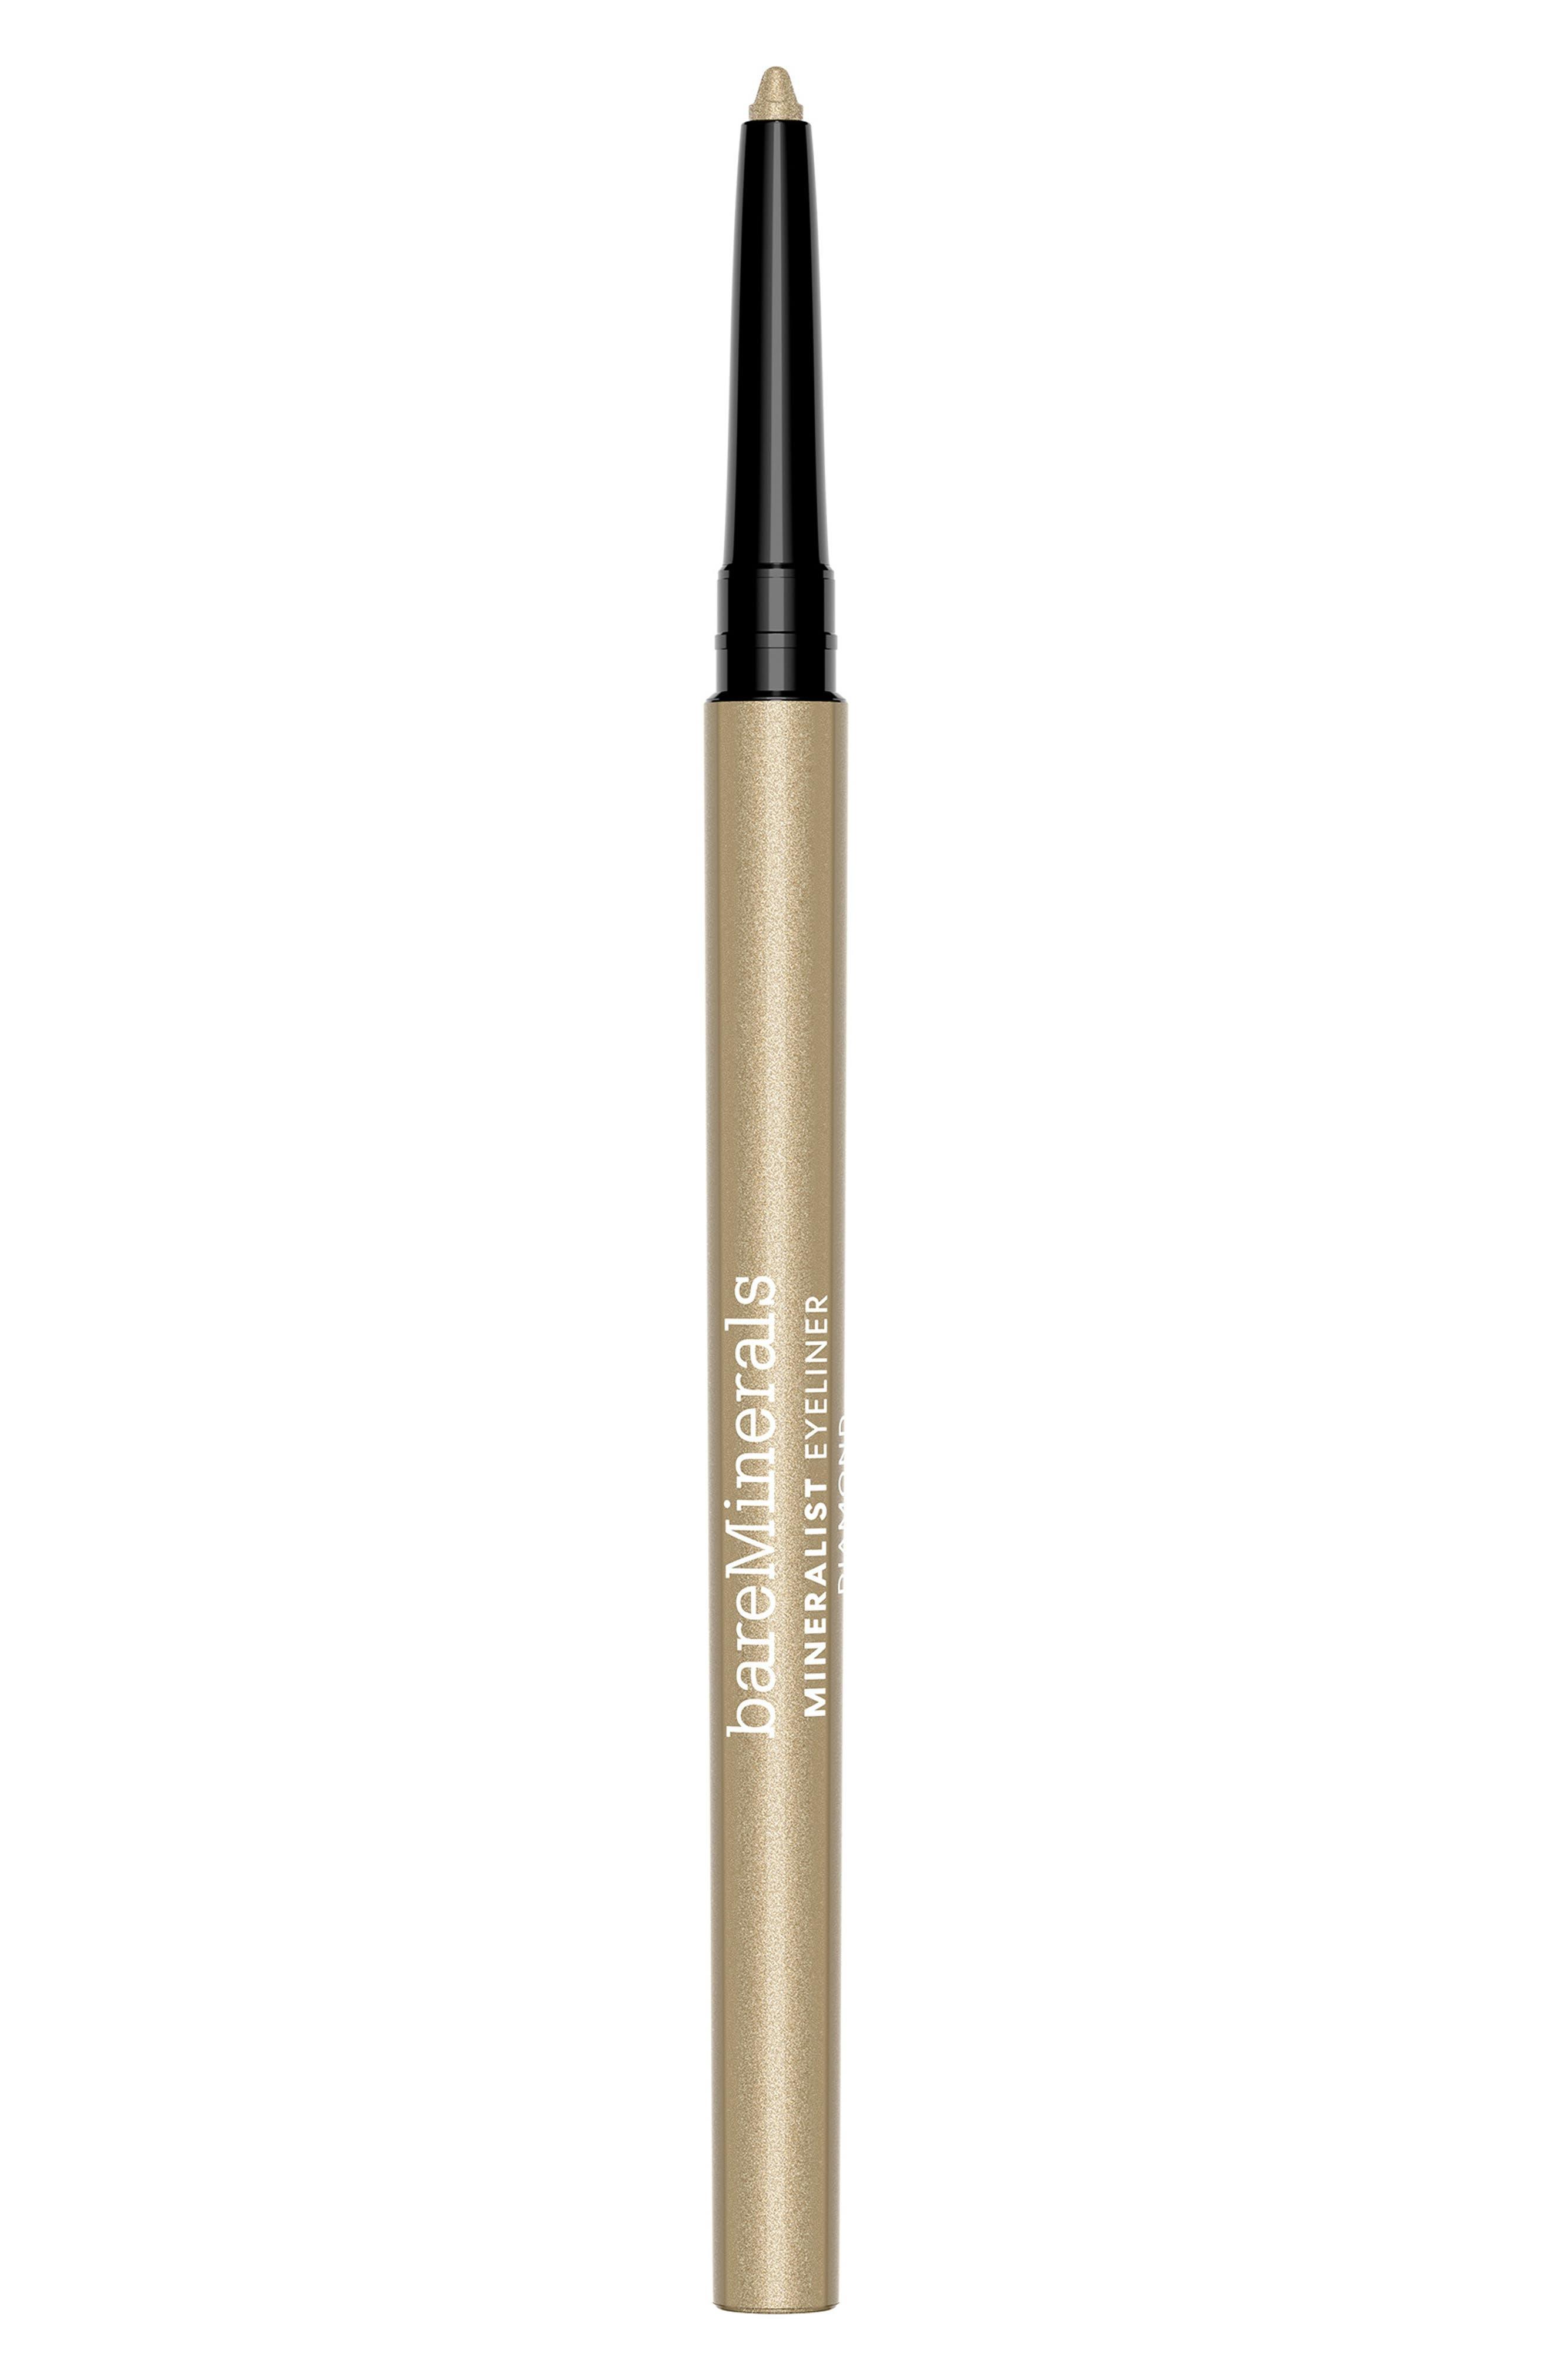 Bareminerals Mineralist Lasting Line Eyeliner